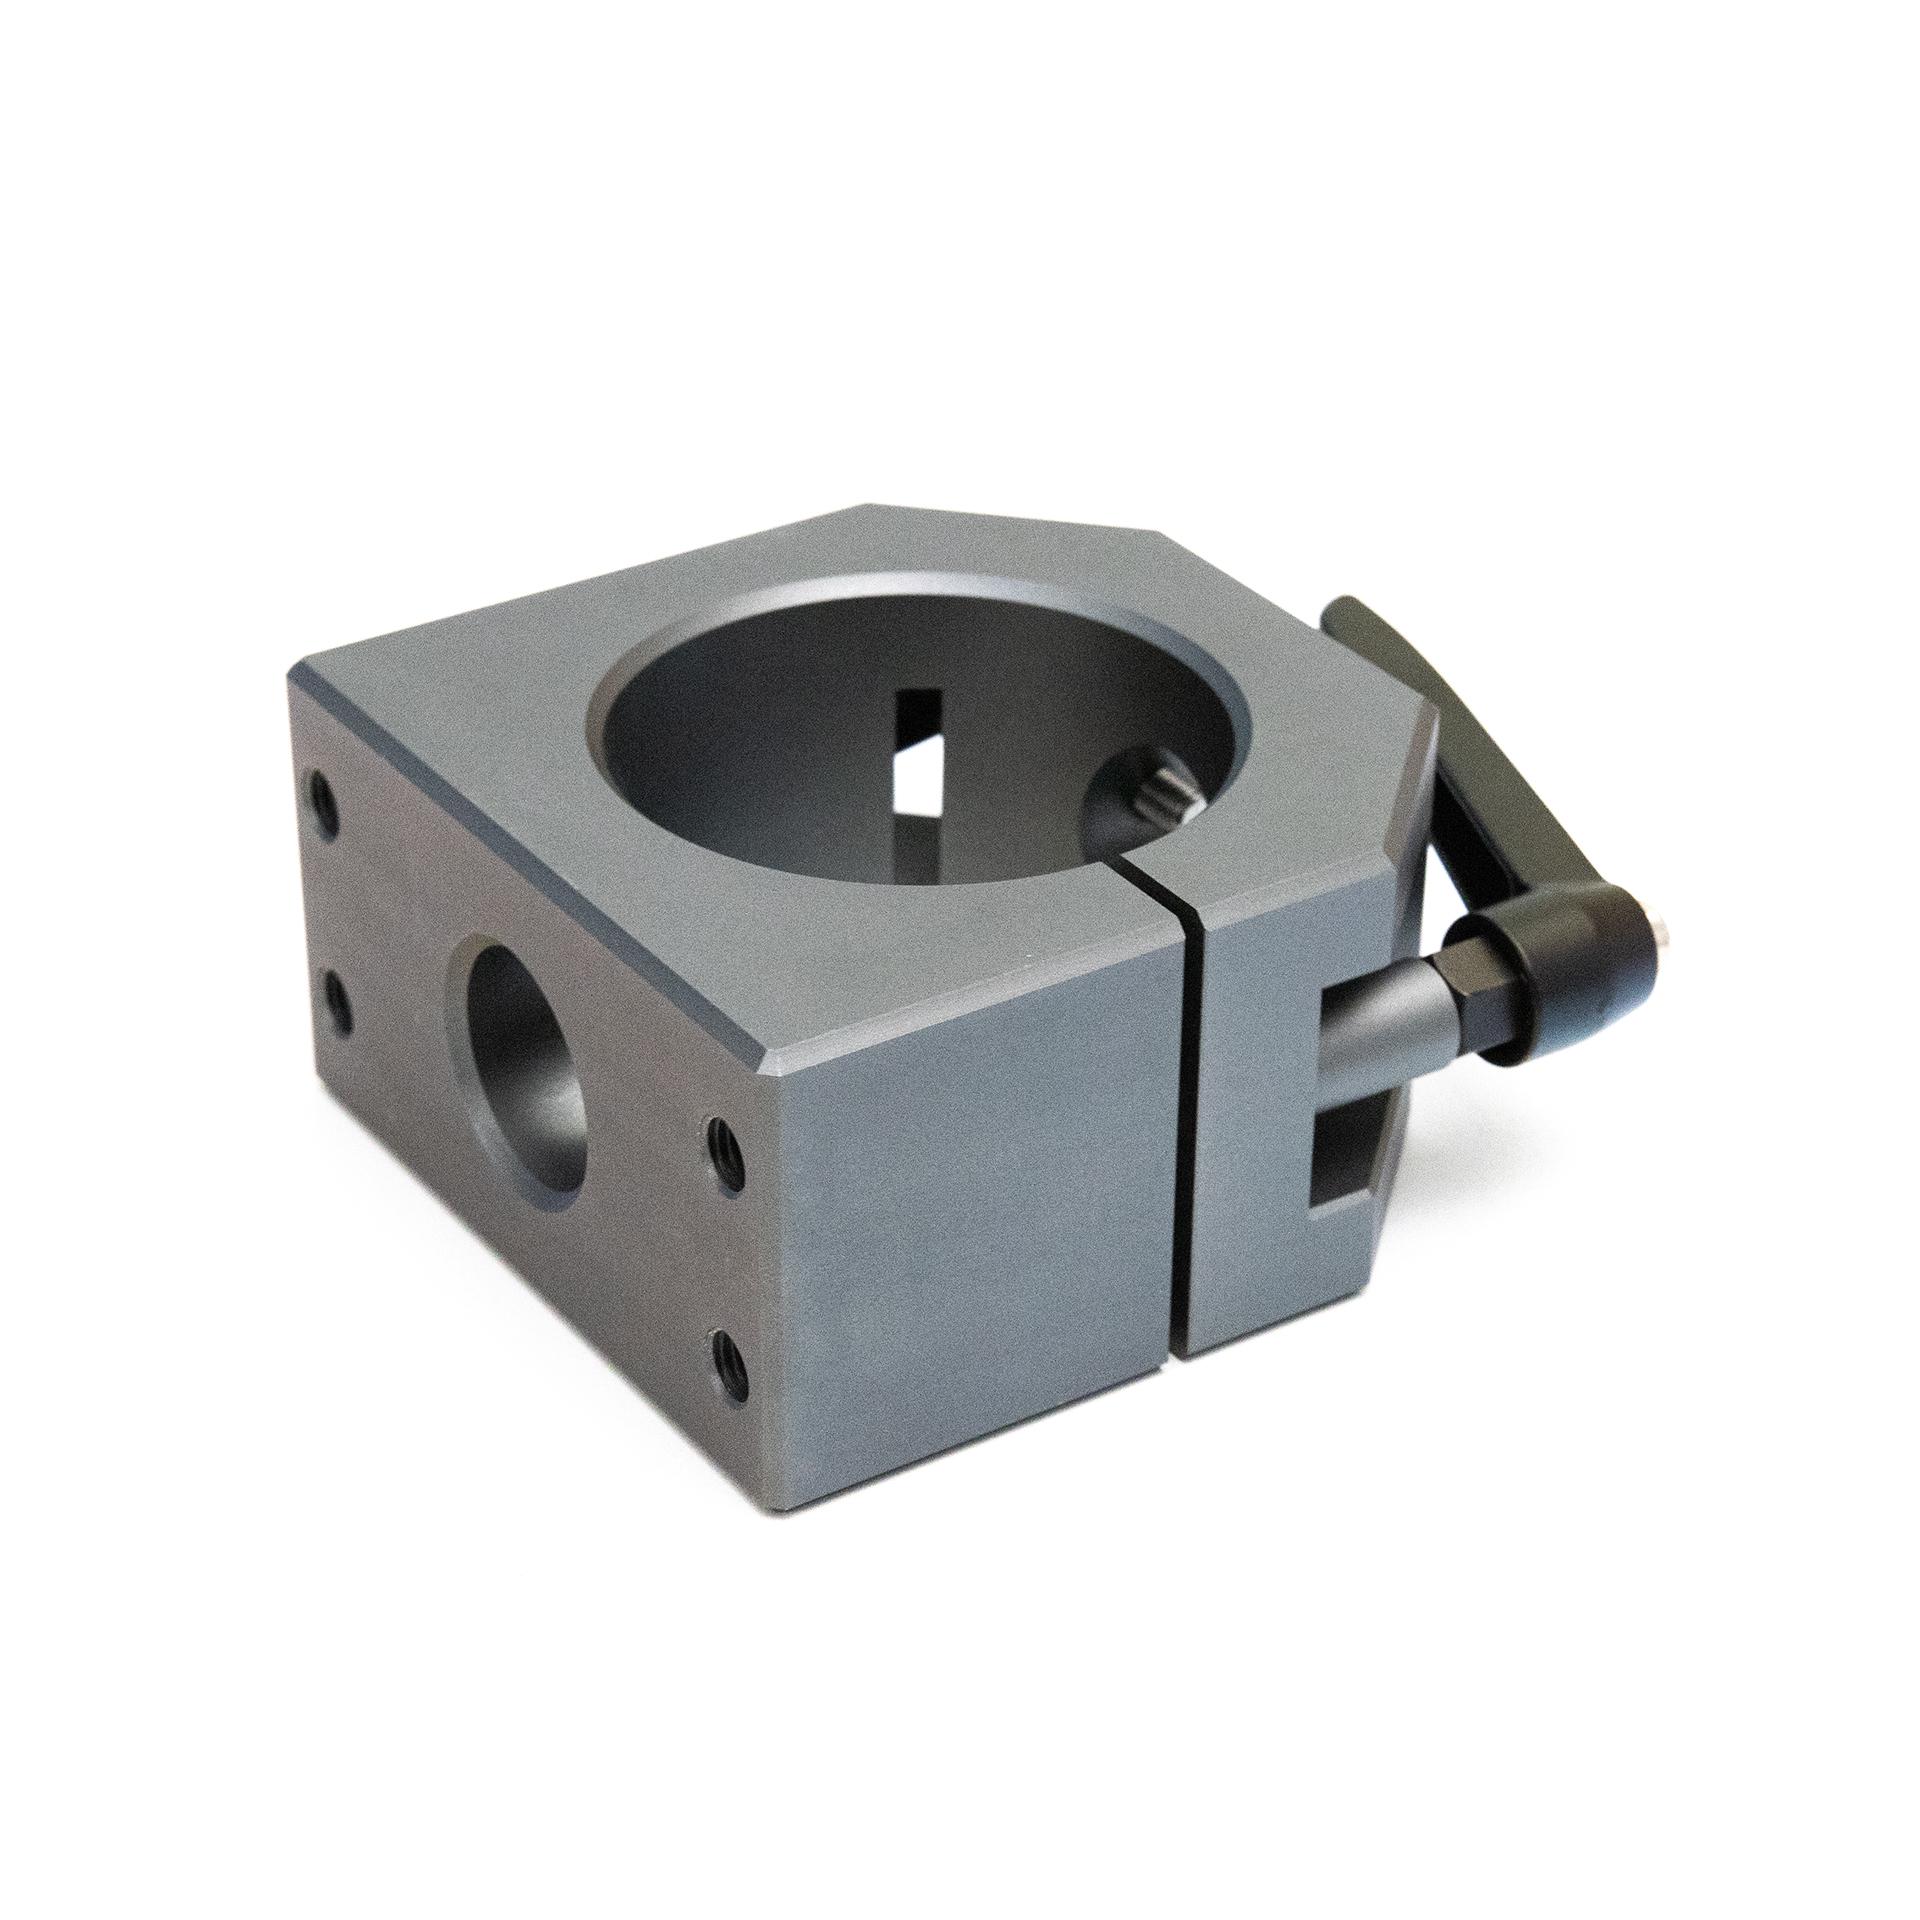 Side EURO Adapter for MOVMAX Slider